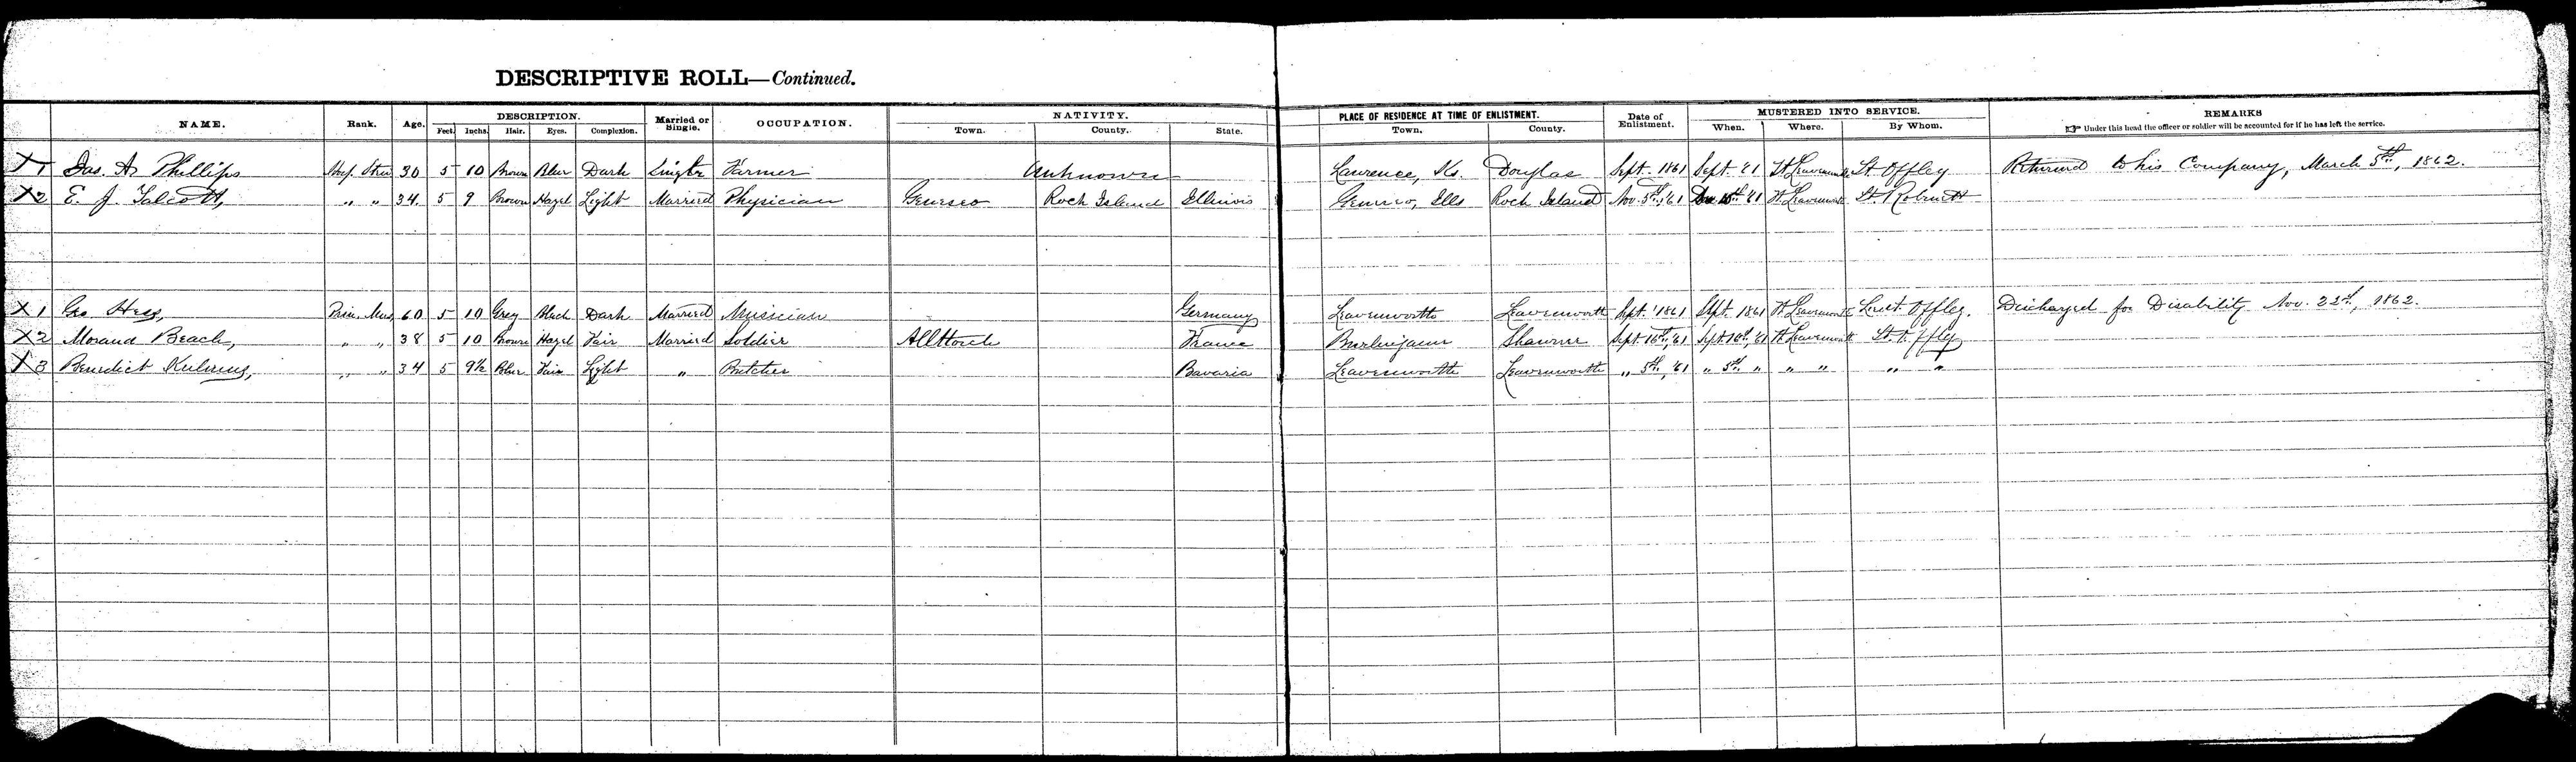 Descriptive roll, Eighth Regiment, Infantry, Kansas Civil War Volunteers, volume 7 - 6